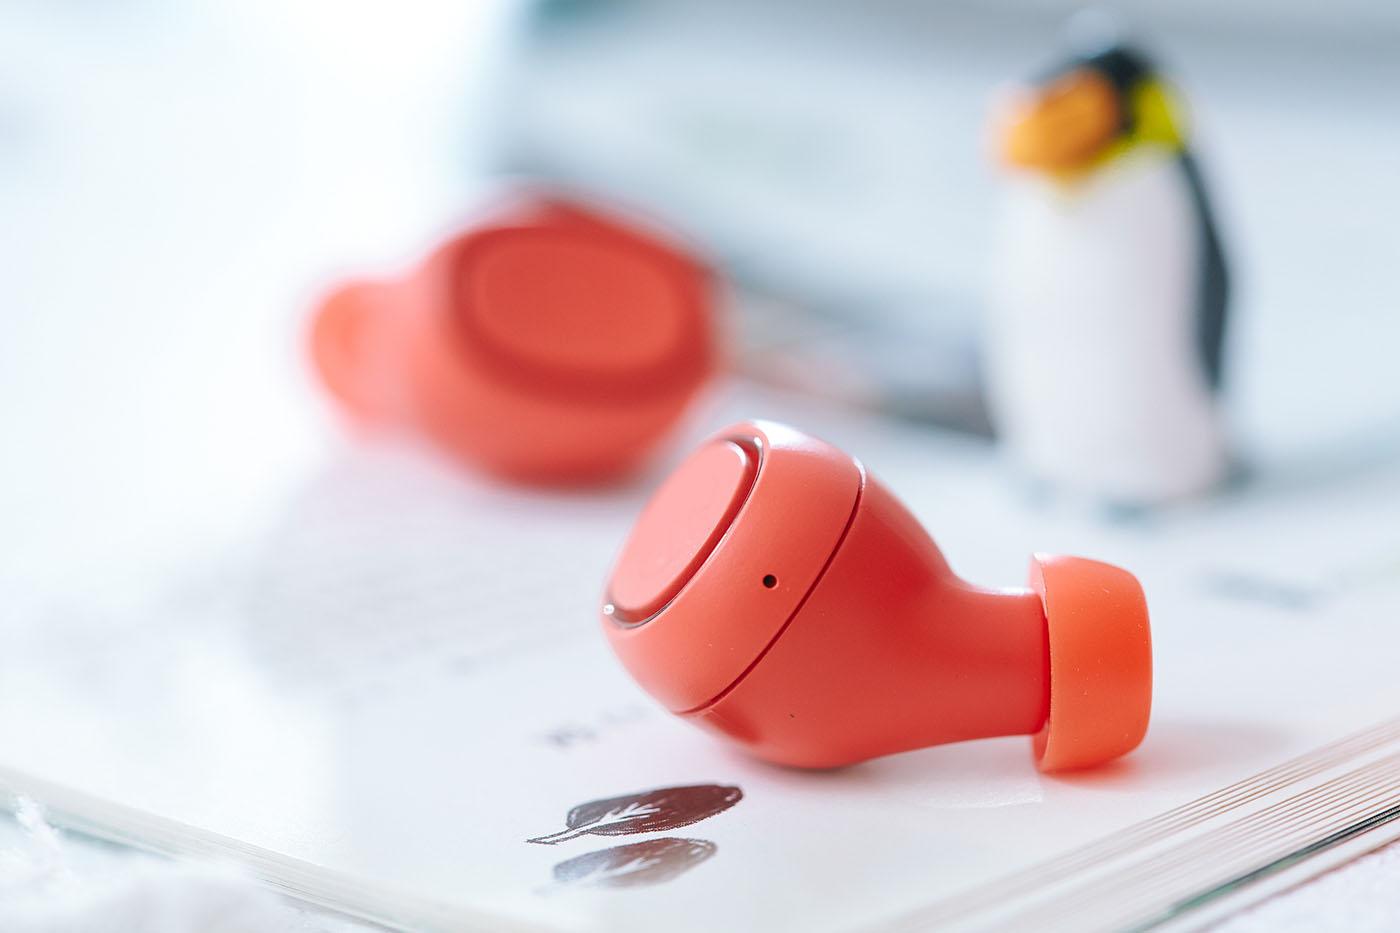 ATH-CK3TW�載Qualcomm® cVc™️ (Clear Voice Capture)技術,透過內藏的麥克風獲取環境音資訊,透過內部晶片處理,在用家進行語音通話時,將環境雜音削減,提升用家與對話方聯繫的講話清晰度,效果很好。